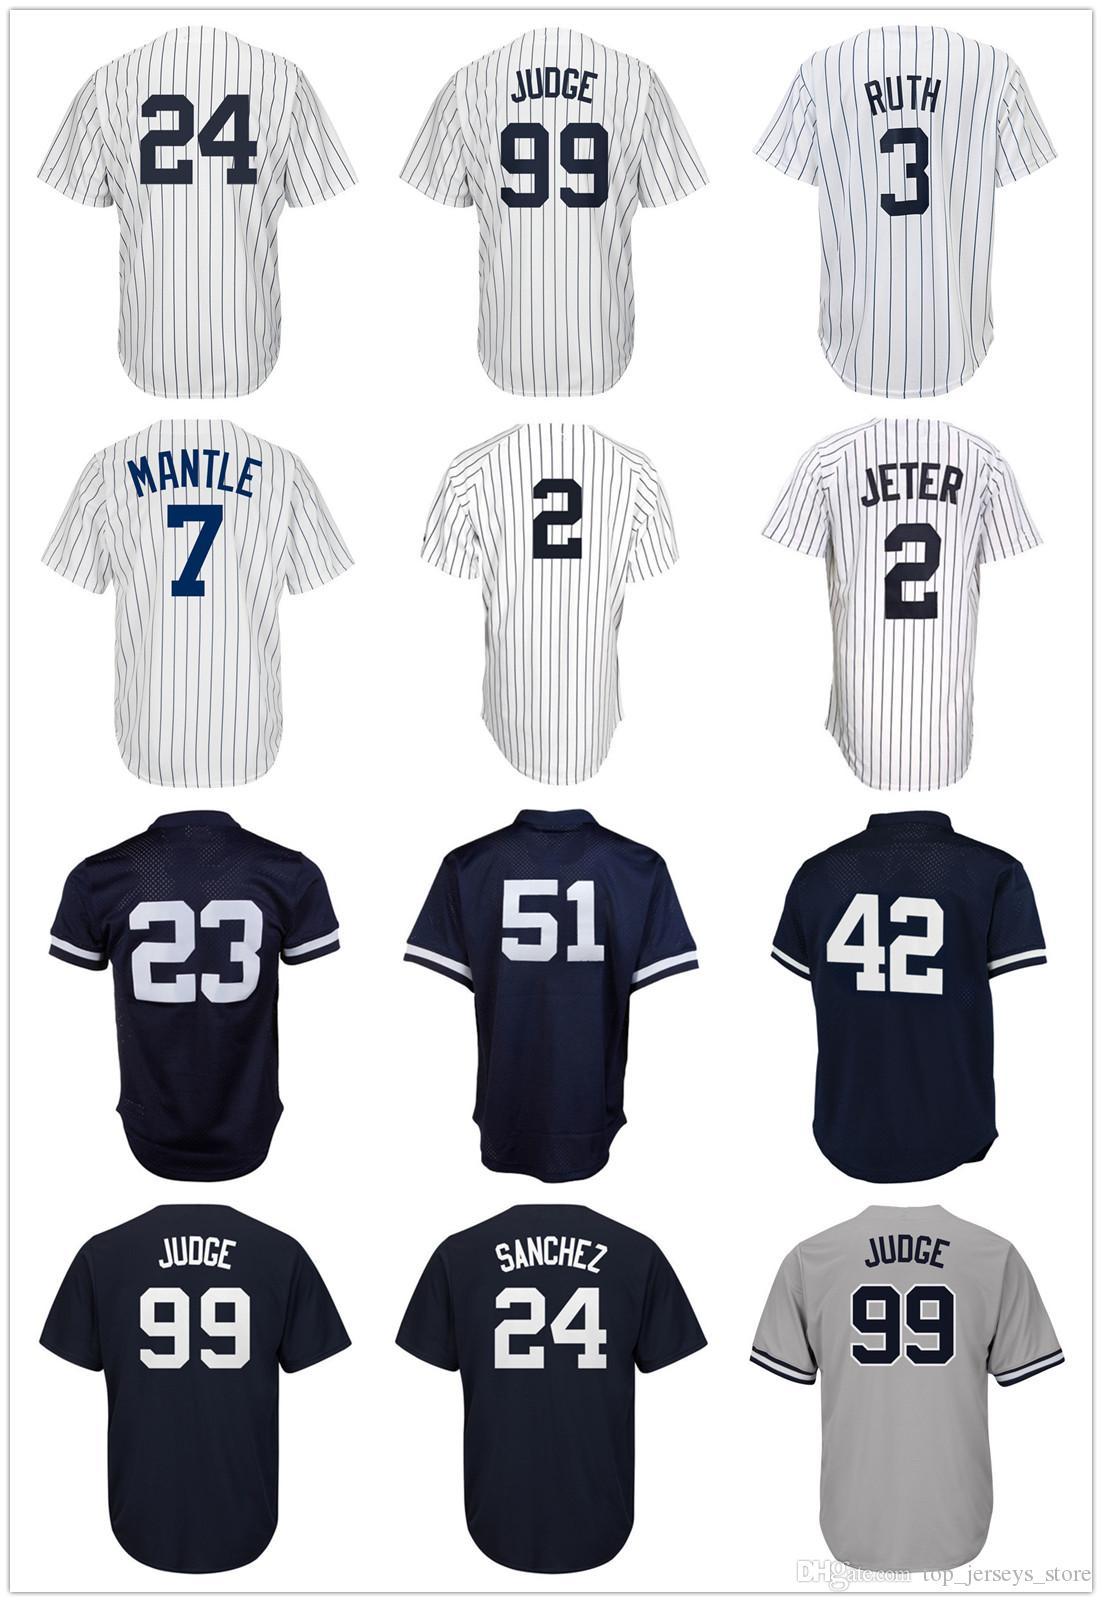 18 High Quality Cheap Men Gary Sanchez Babe Ruth Aaron Judge Jerseys ... b3e3496888b2